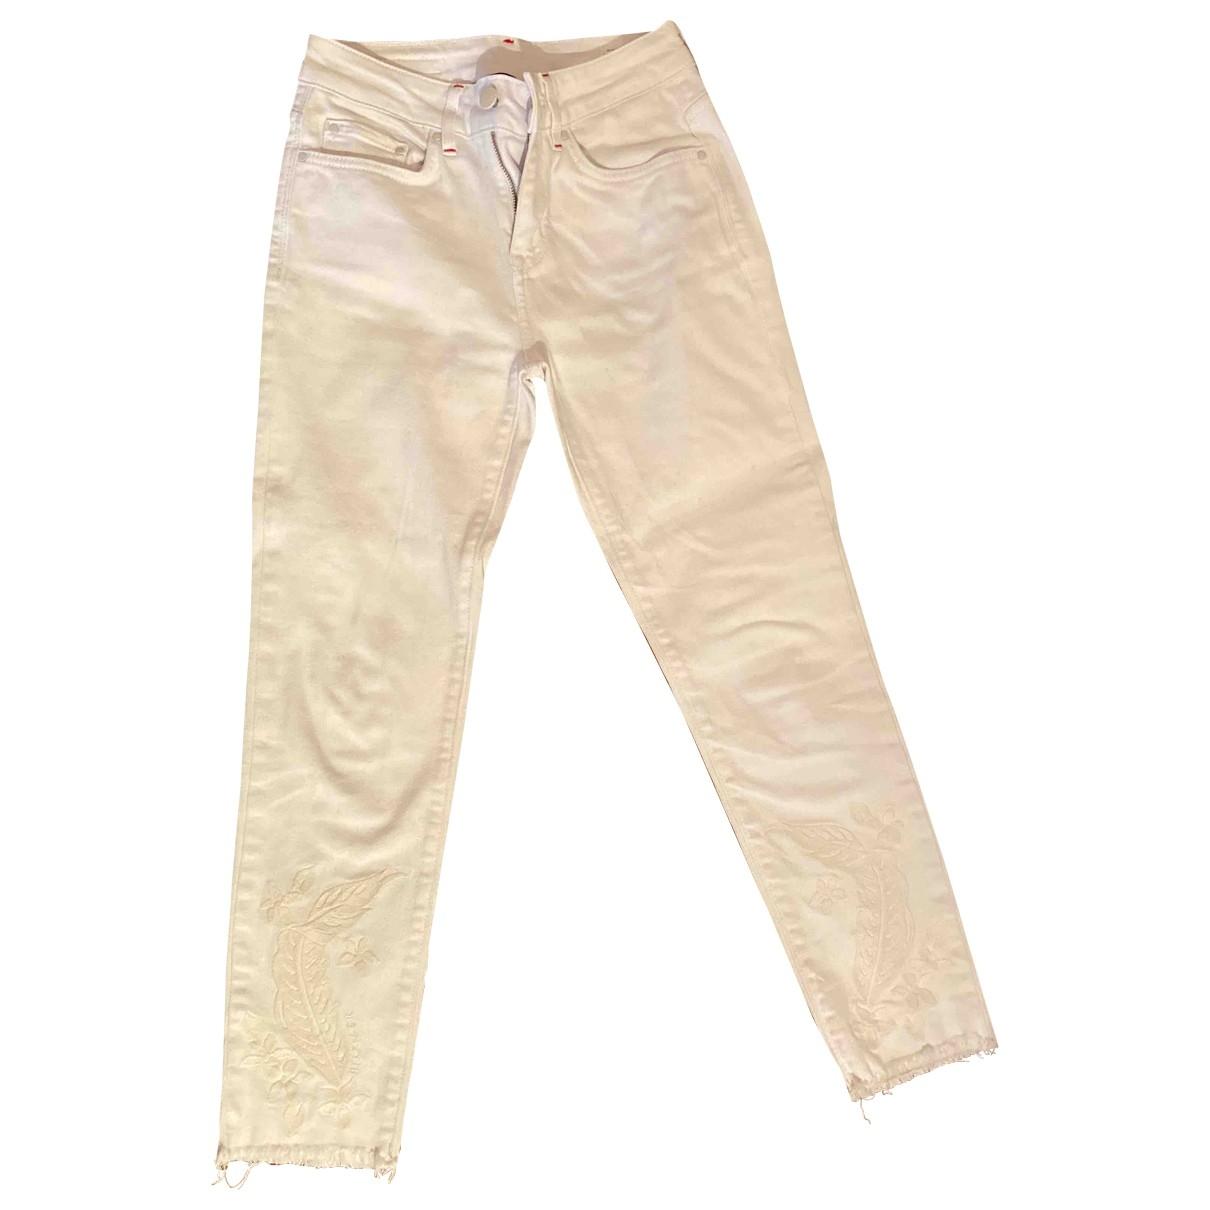 Tommy Hilfiger \N White Denim - Jeans Jeans for Women 26 US